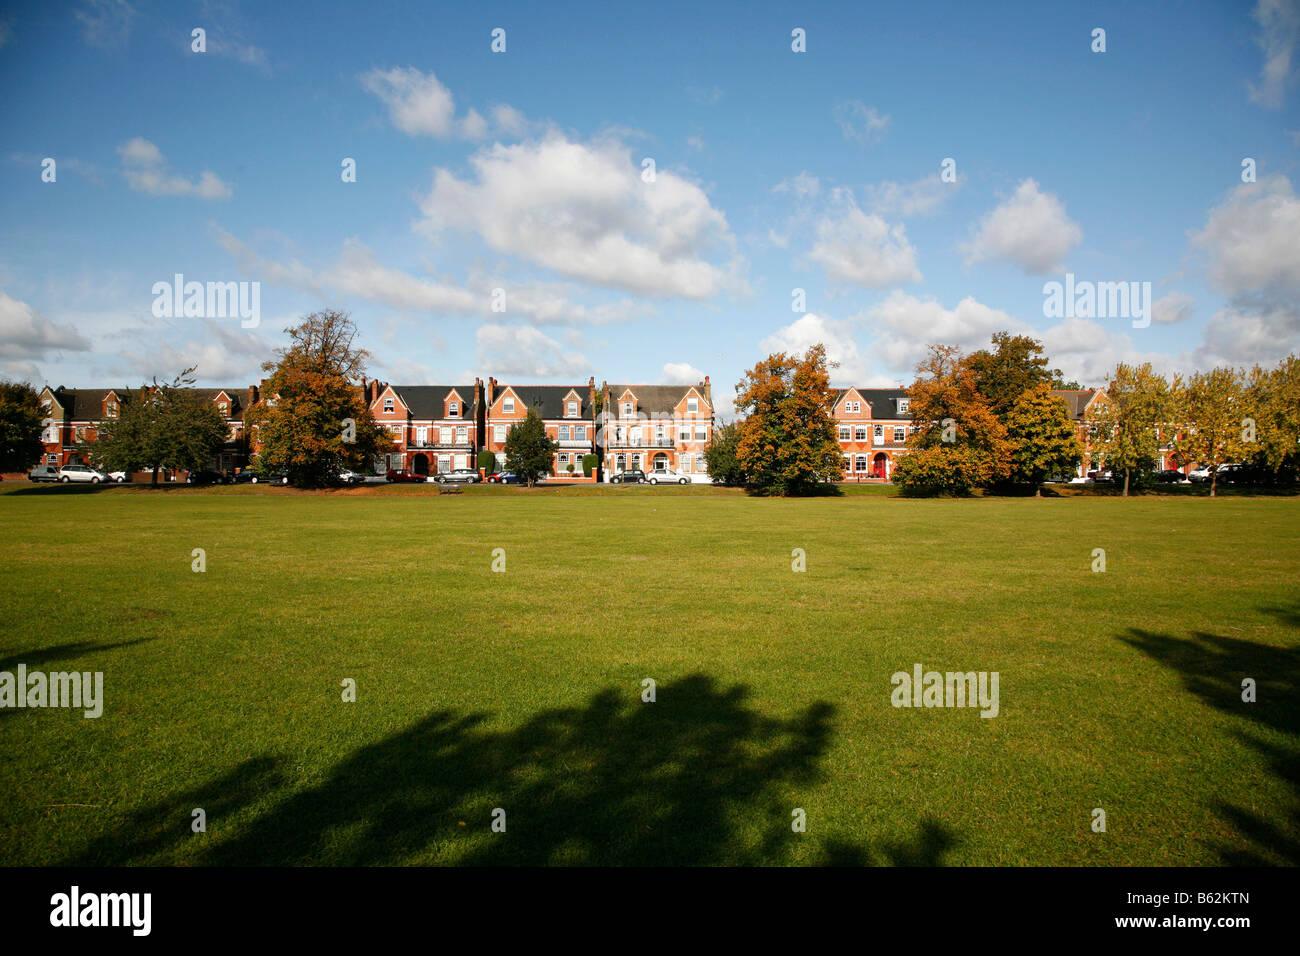 Tooting Graveney Common, Tooting, London - Stock Image